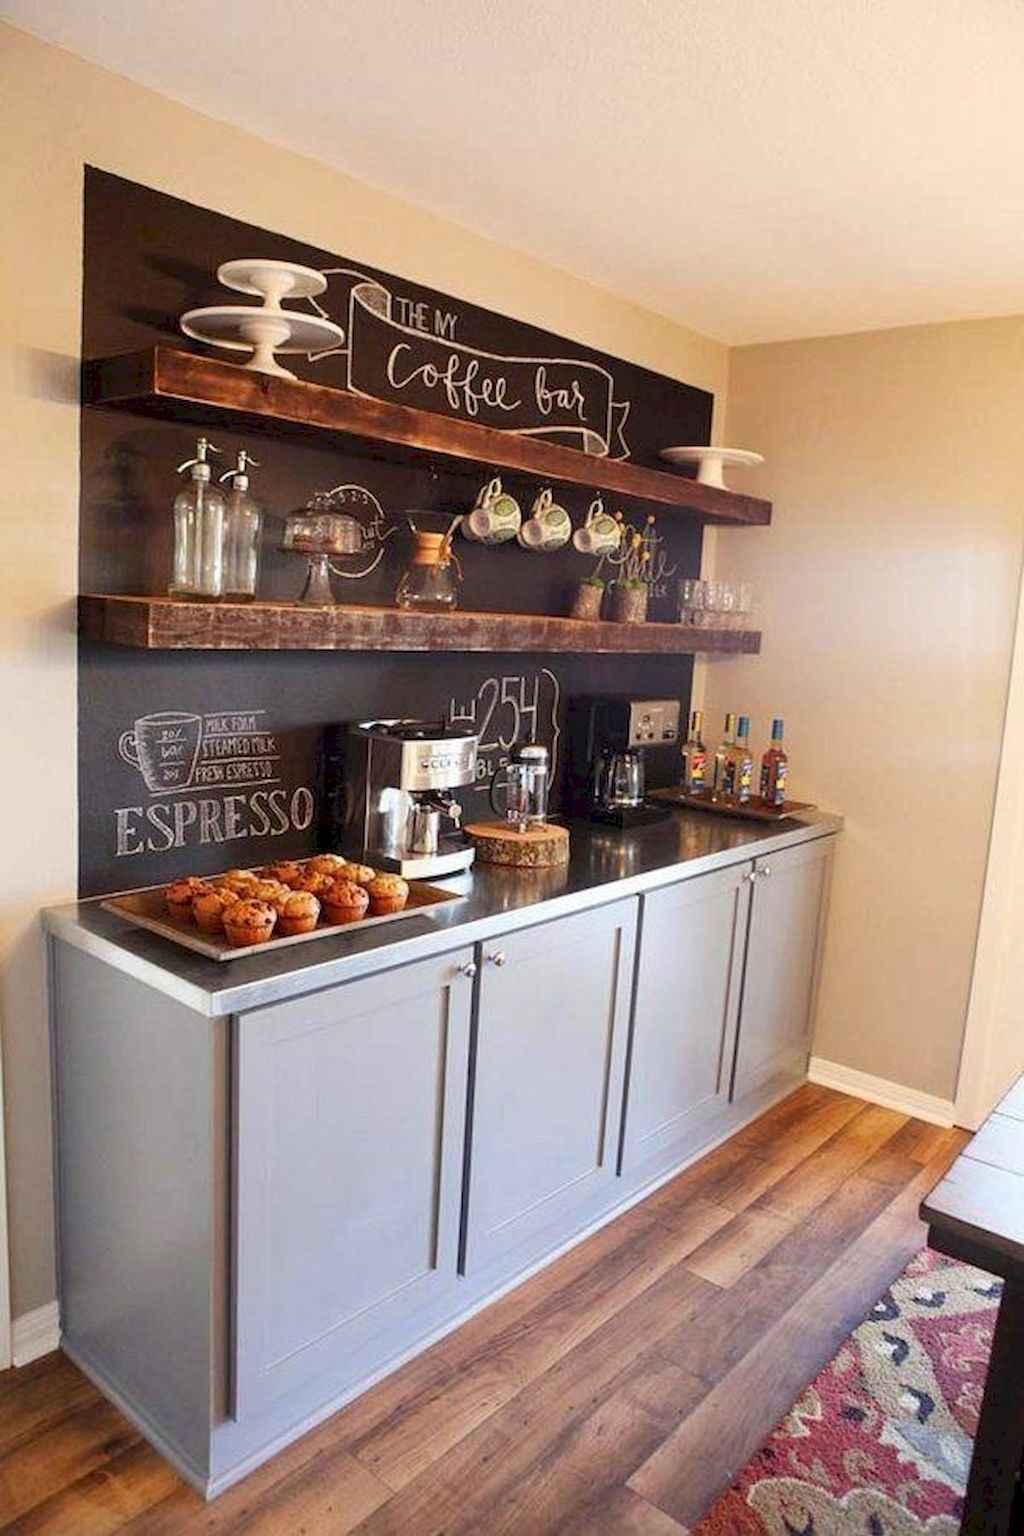 Diy Home Coffee Bar Ideas For Coffee Addict 13 Room A Holic